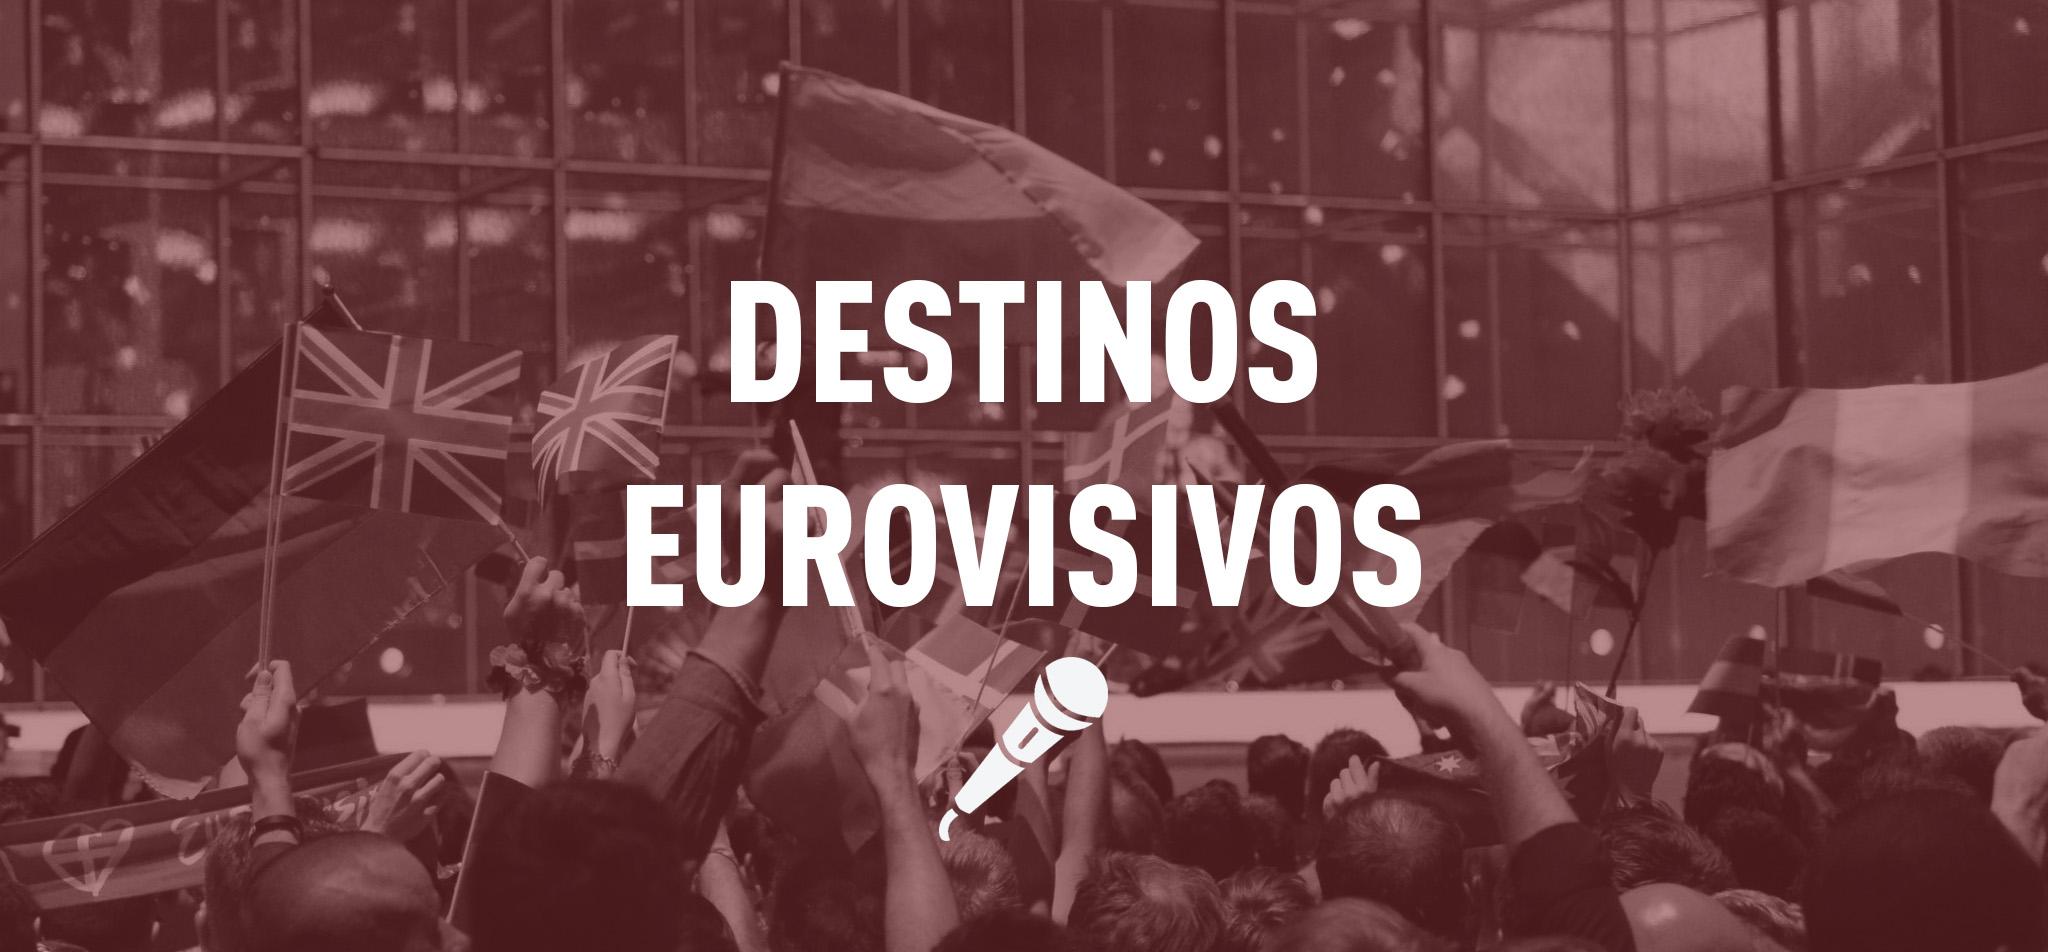 DESTINOS EUROVISIVOS